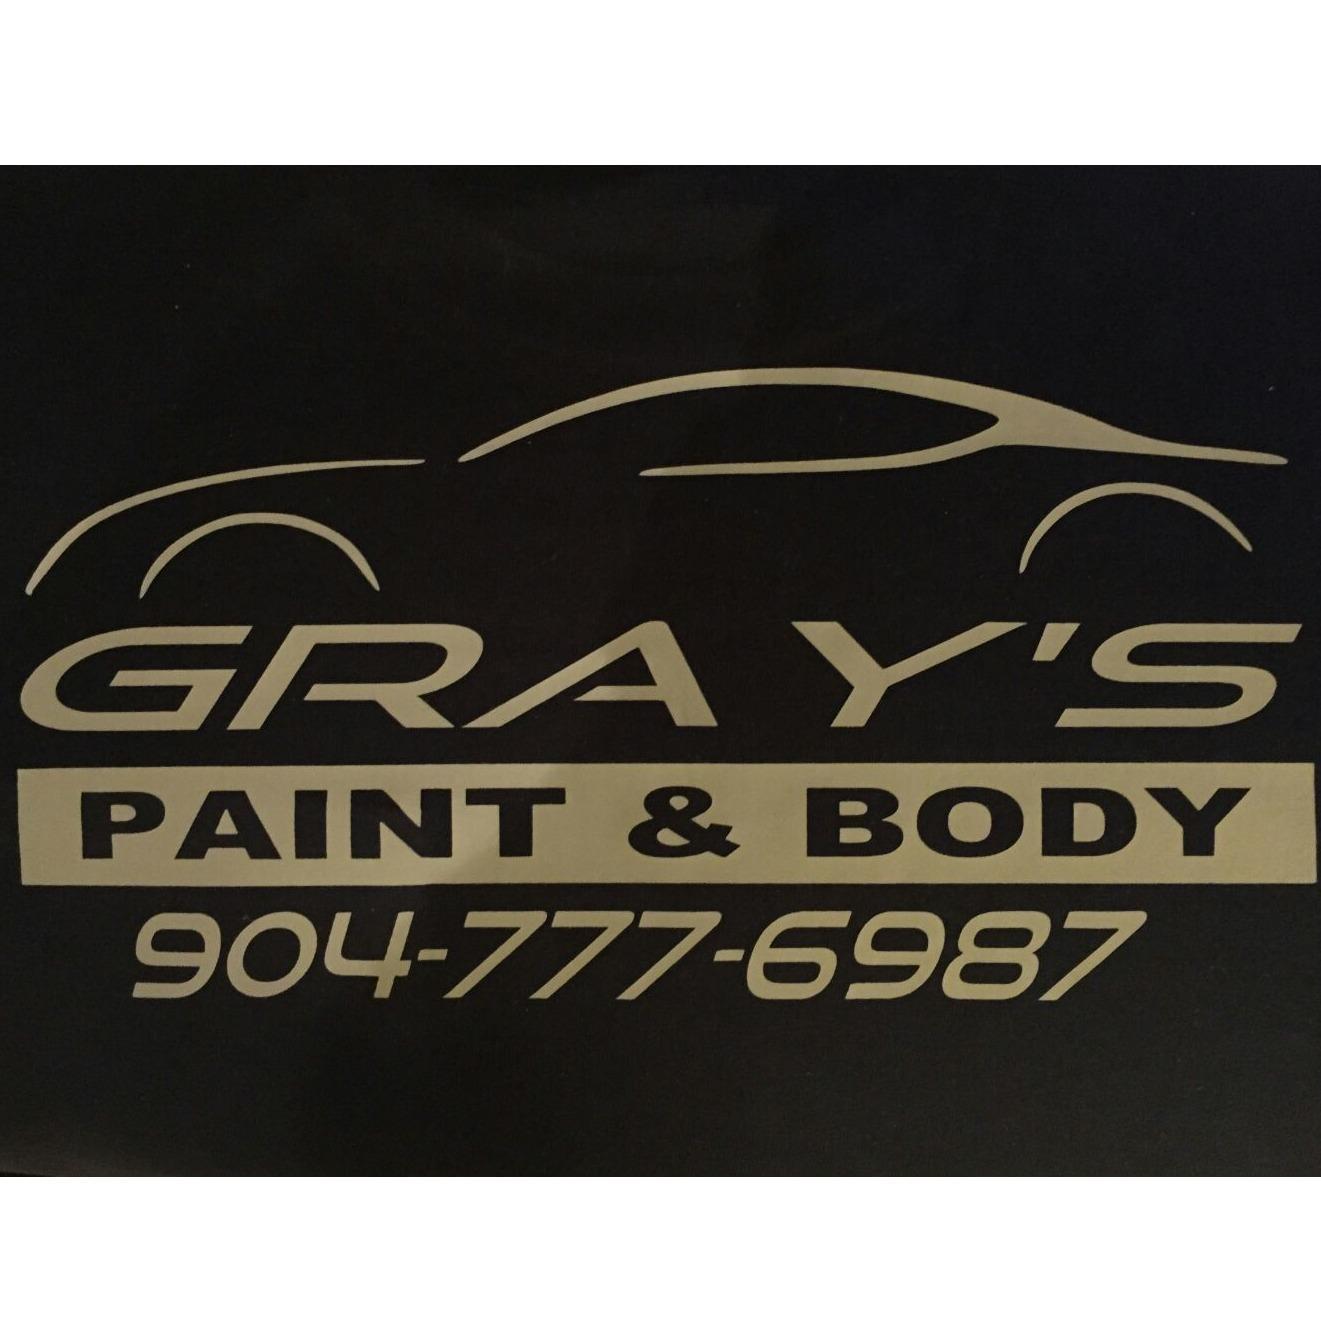 Grays Paint & Body